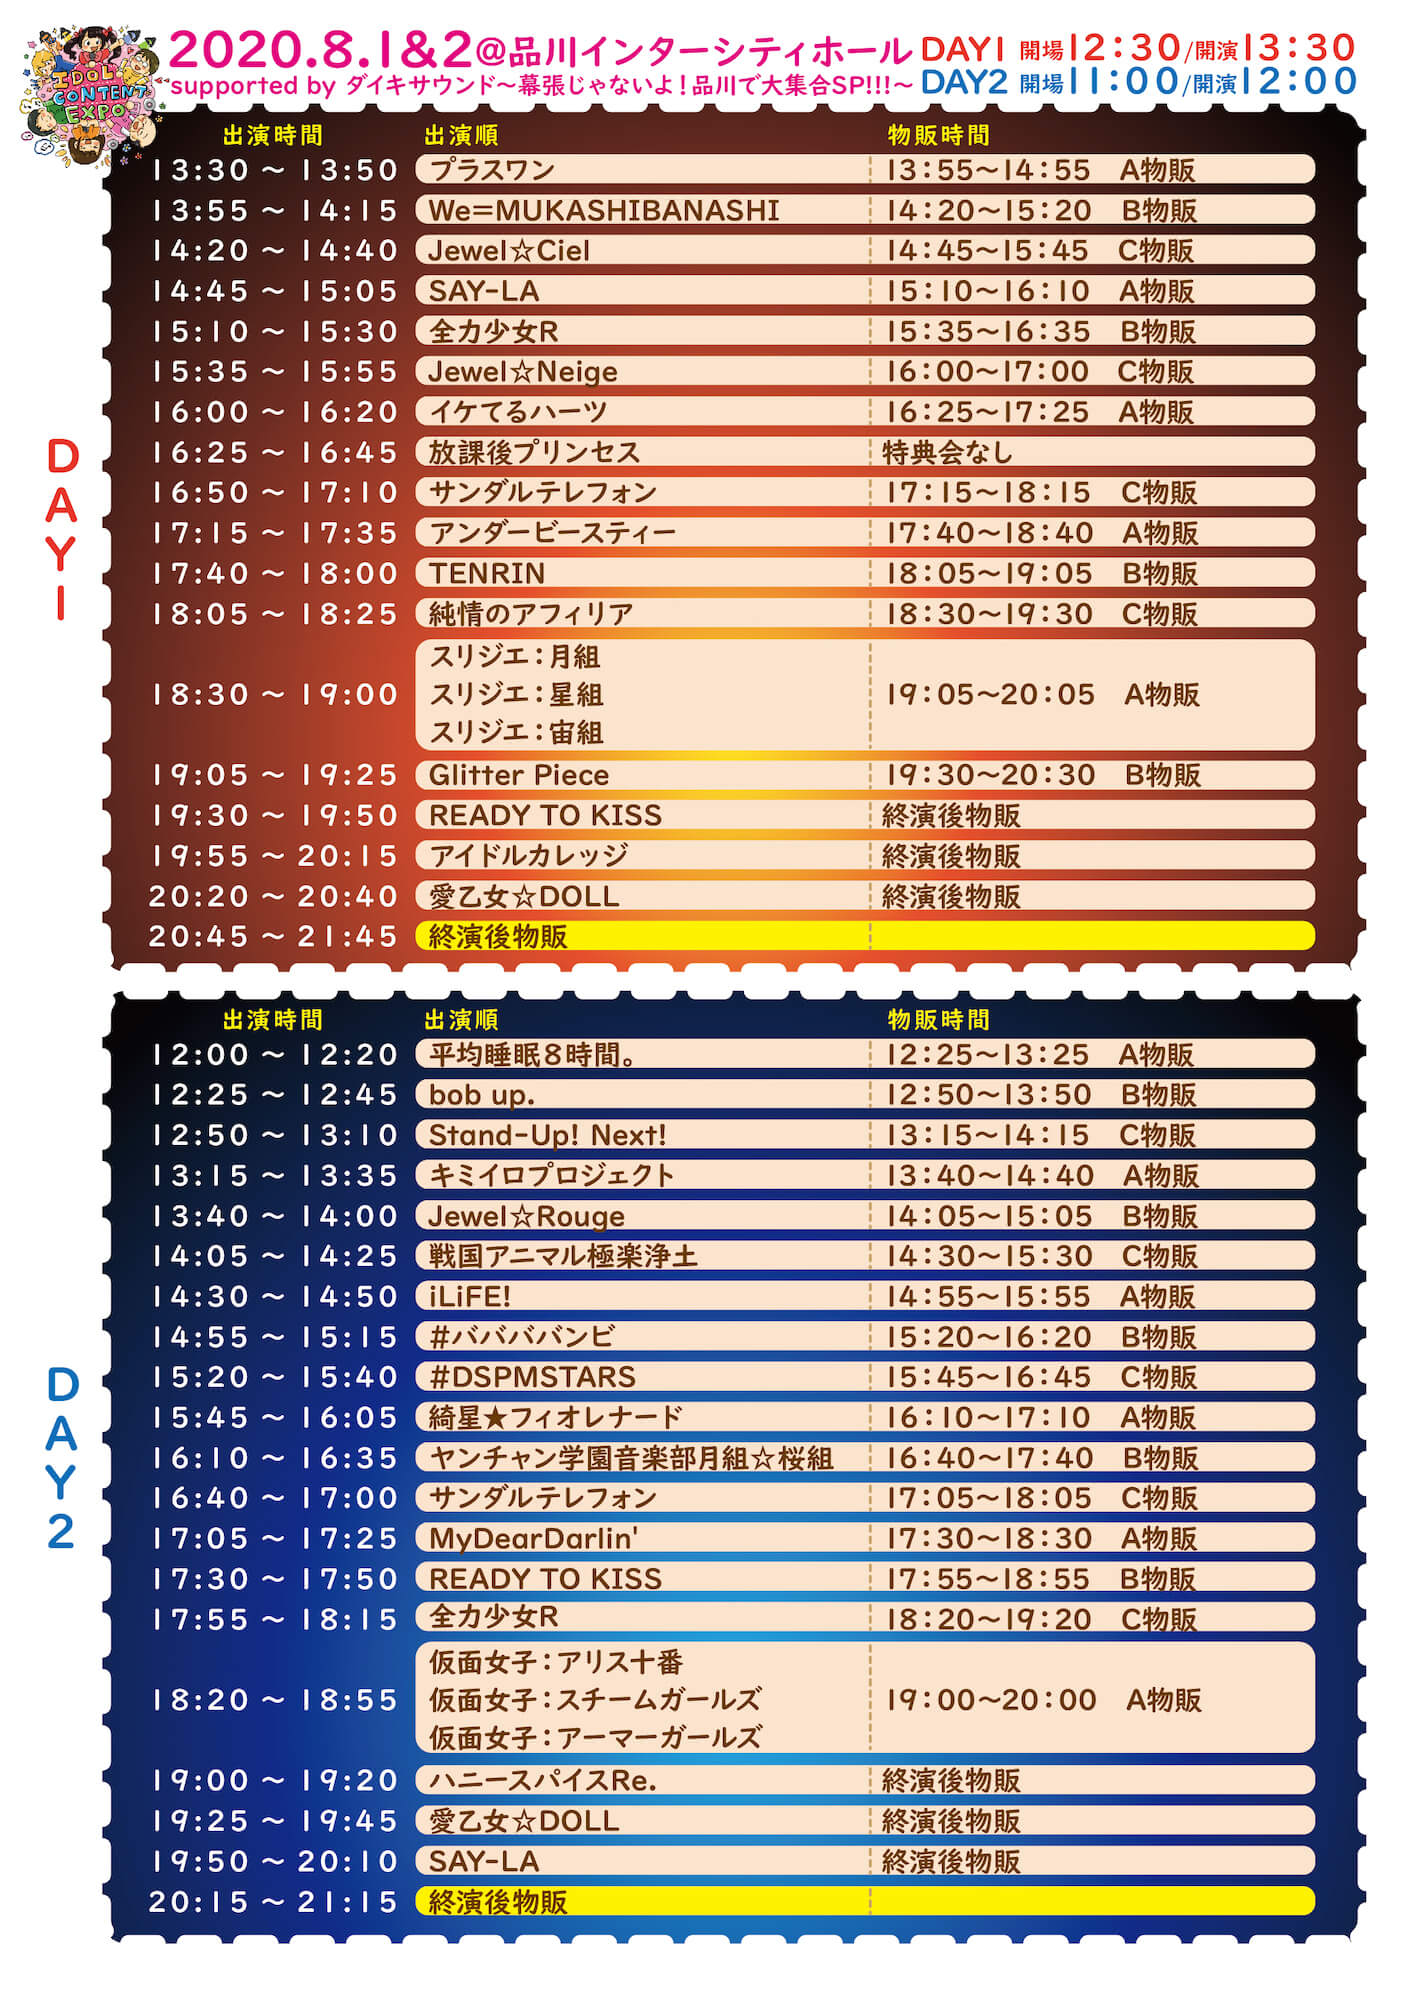 『IDOL CONTENT EXPO @ 品川インターシティホール supported byダイキサウンド ~幕張じゃないよ!品川で大集合SP!!!~ 』タイムテーブル発表